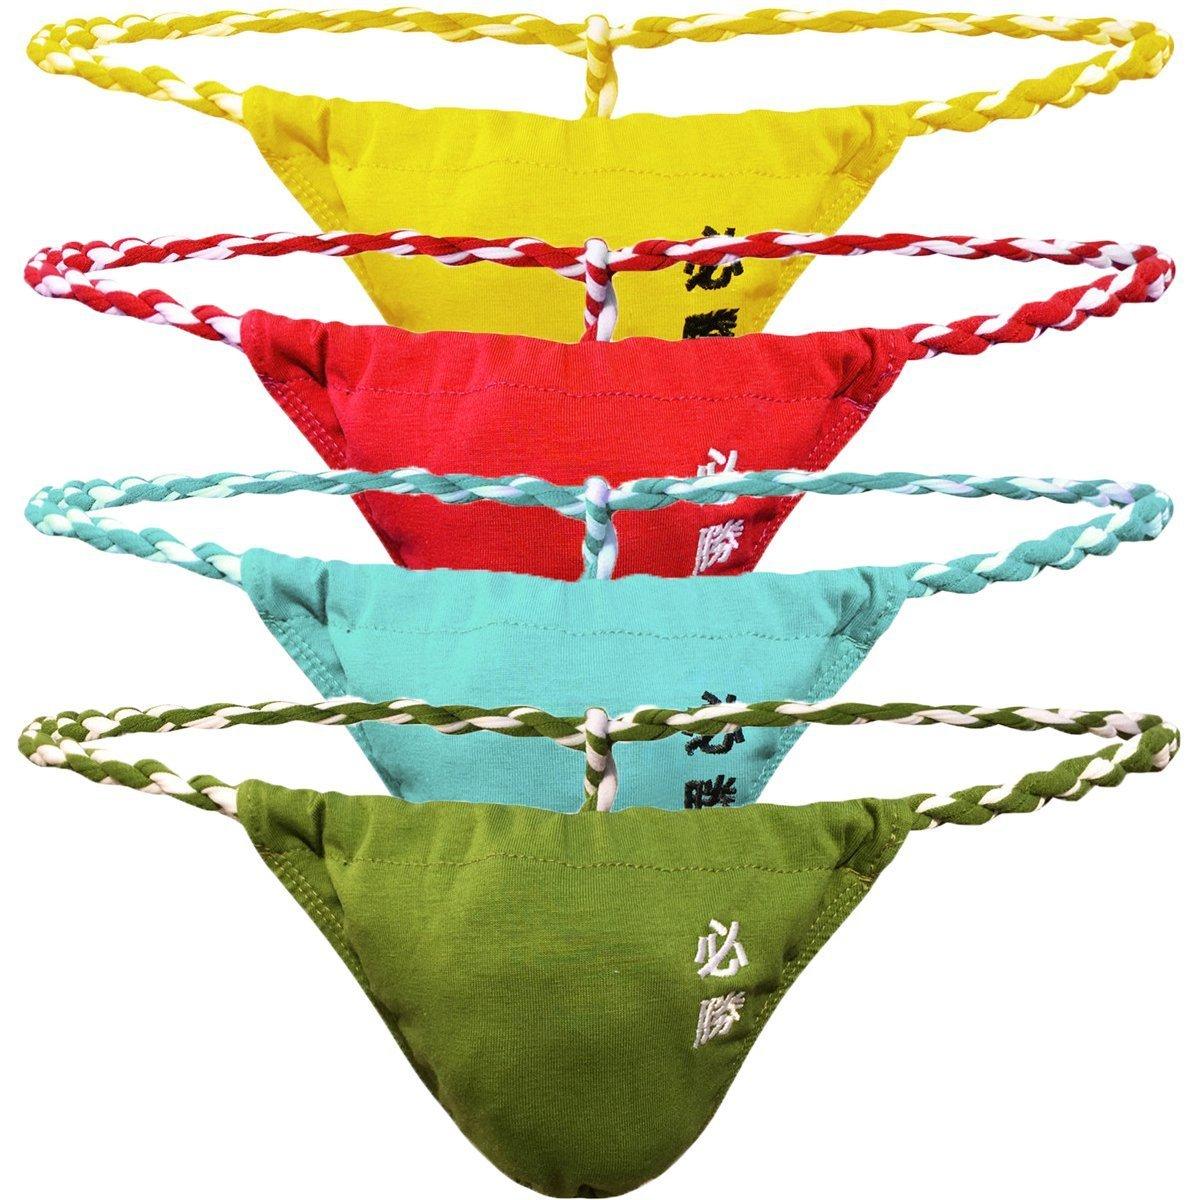 GuangmingXi Men's G-String Thong Underwear Low Rise Sumo Wrestling Bikini Briefs Panties (Color 3 (Yellow/Light Blue/Green/red), L (30''-32''))